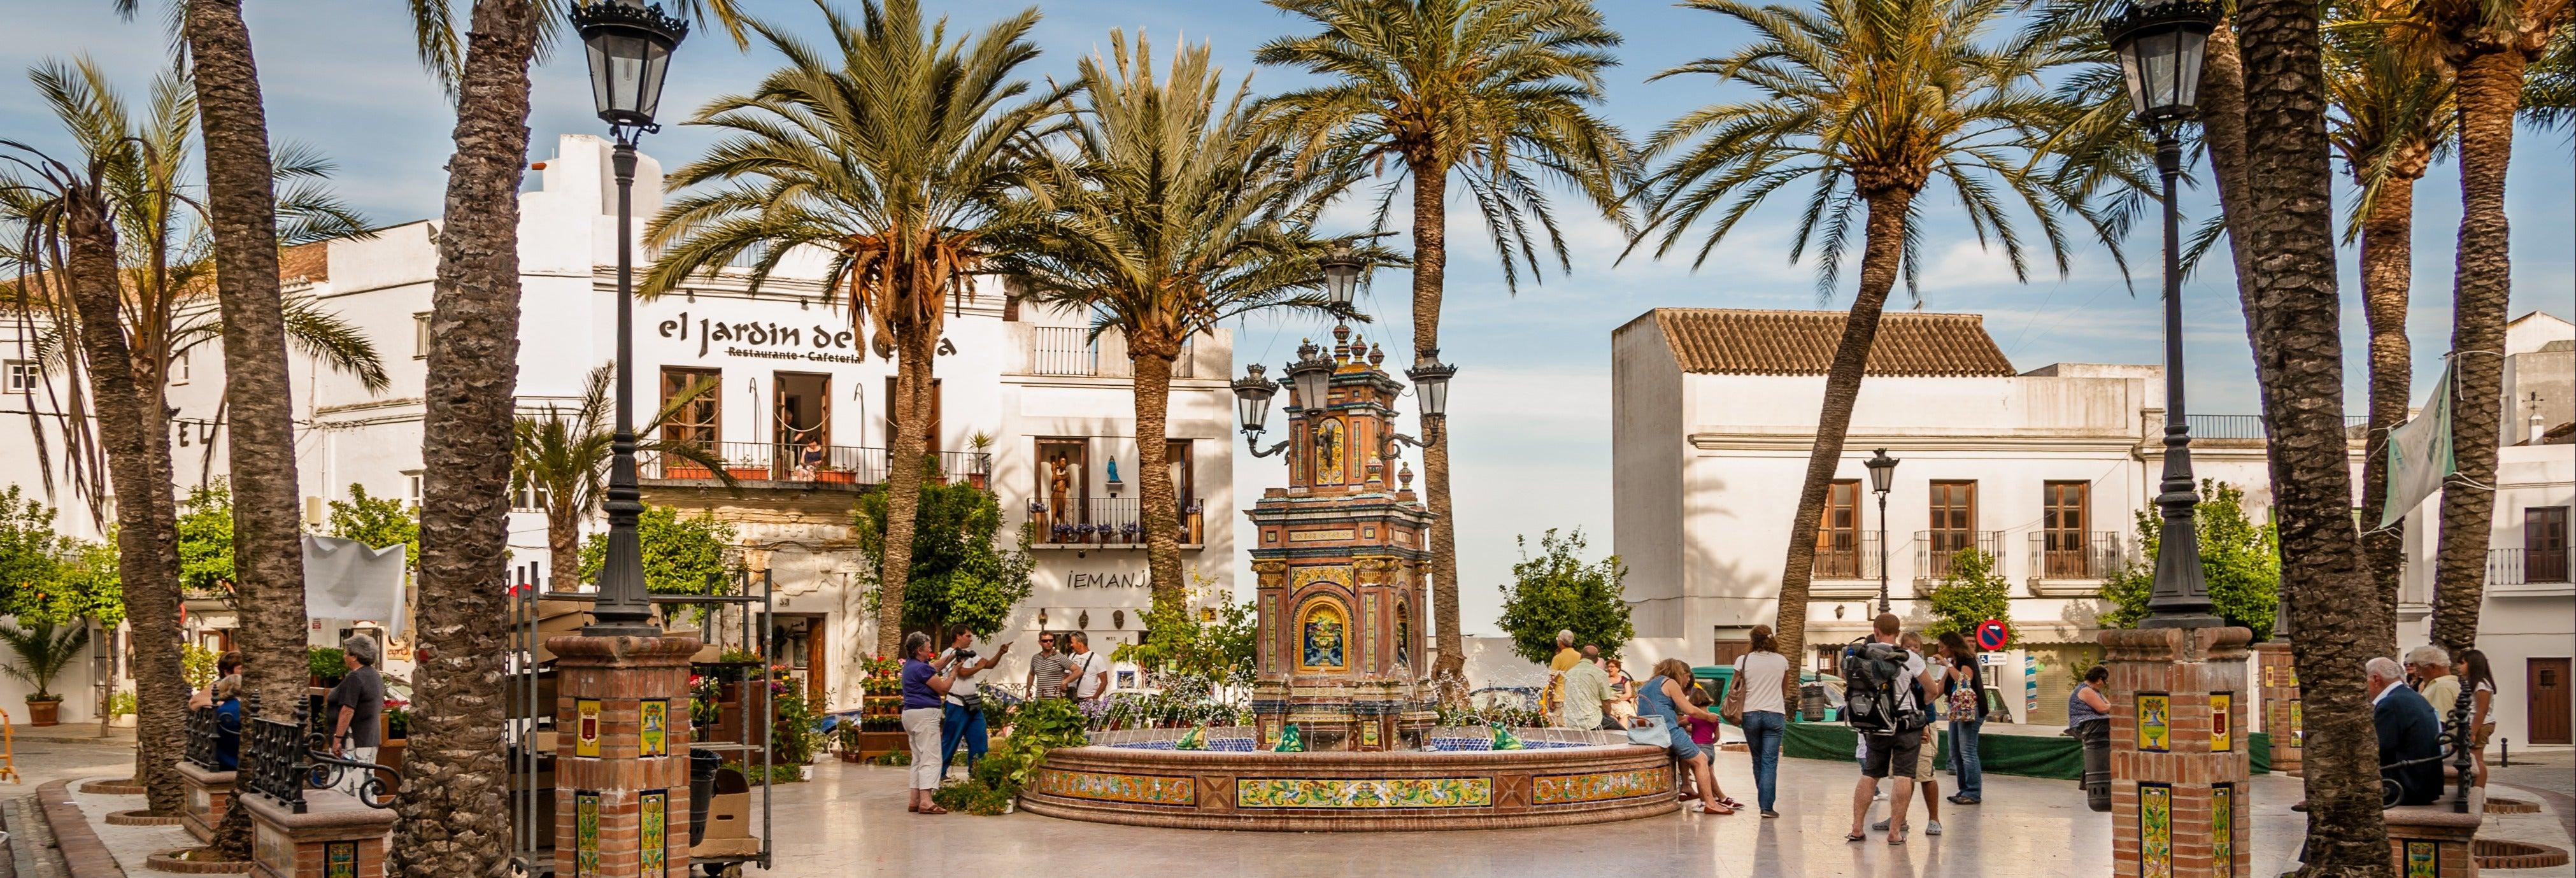 Free tour por Vejer de la Frontera ¡Gratis!